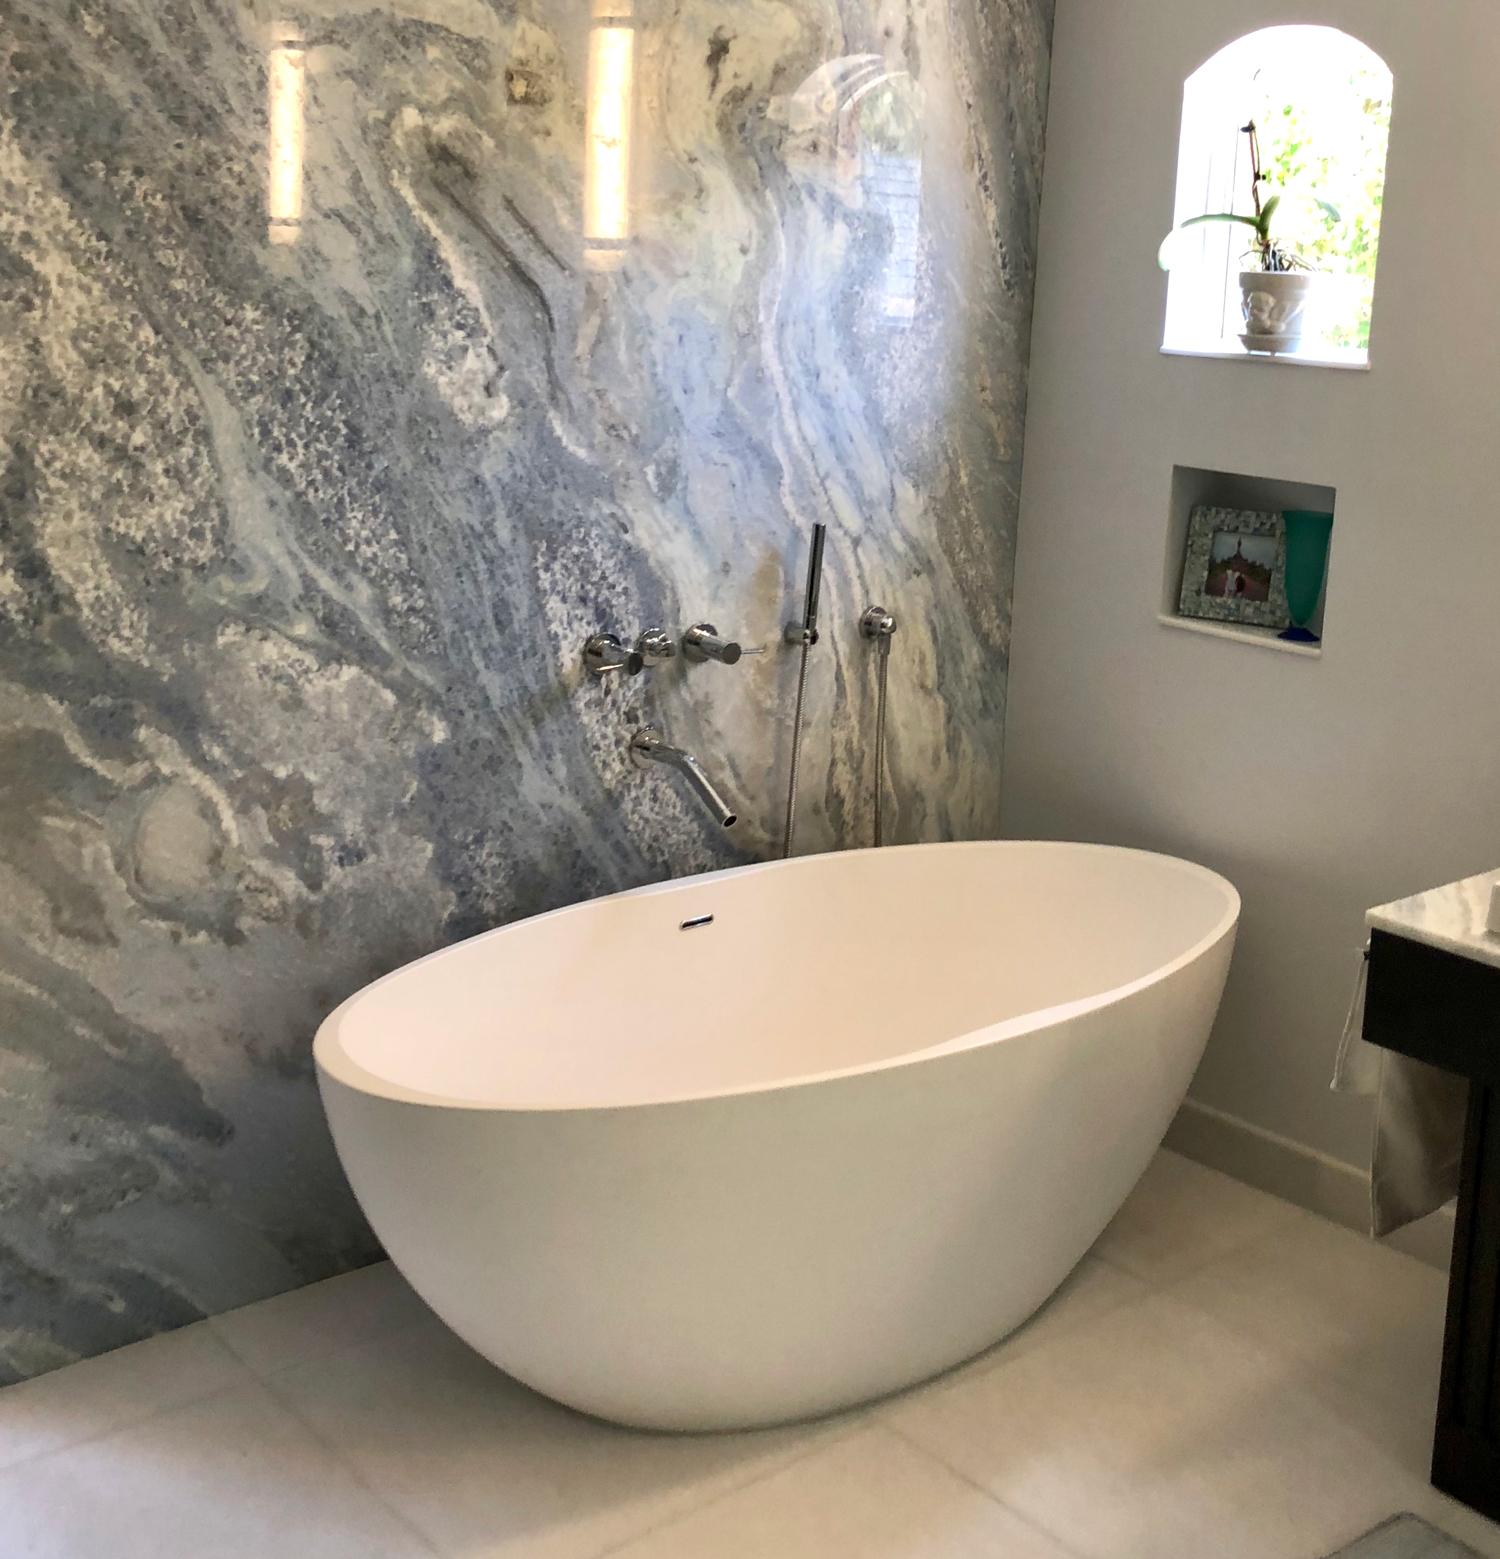 Freestanding Bathtub Model Bw 04 L Stone Resin